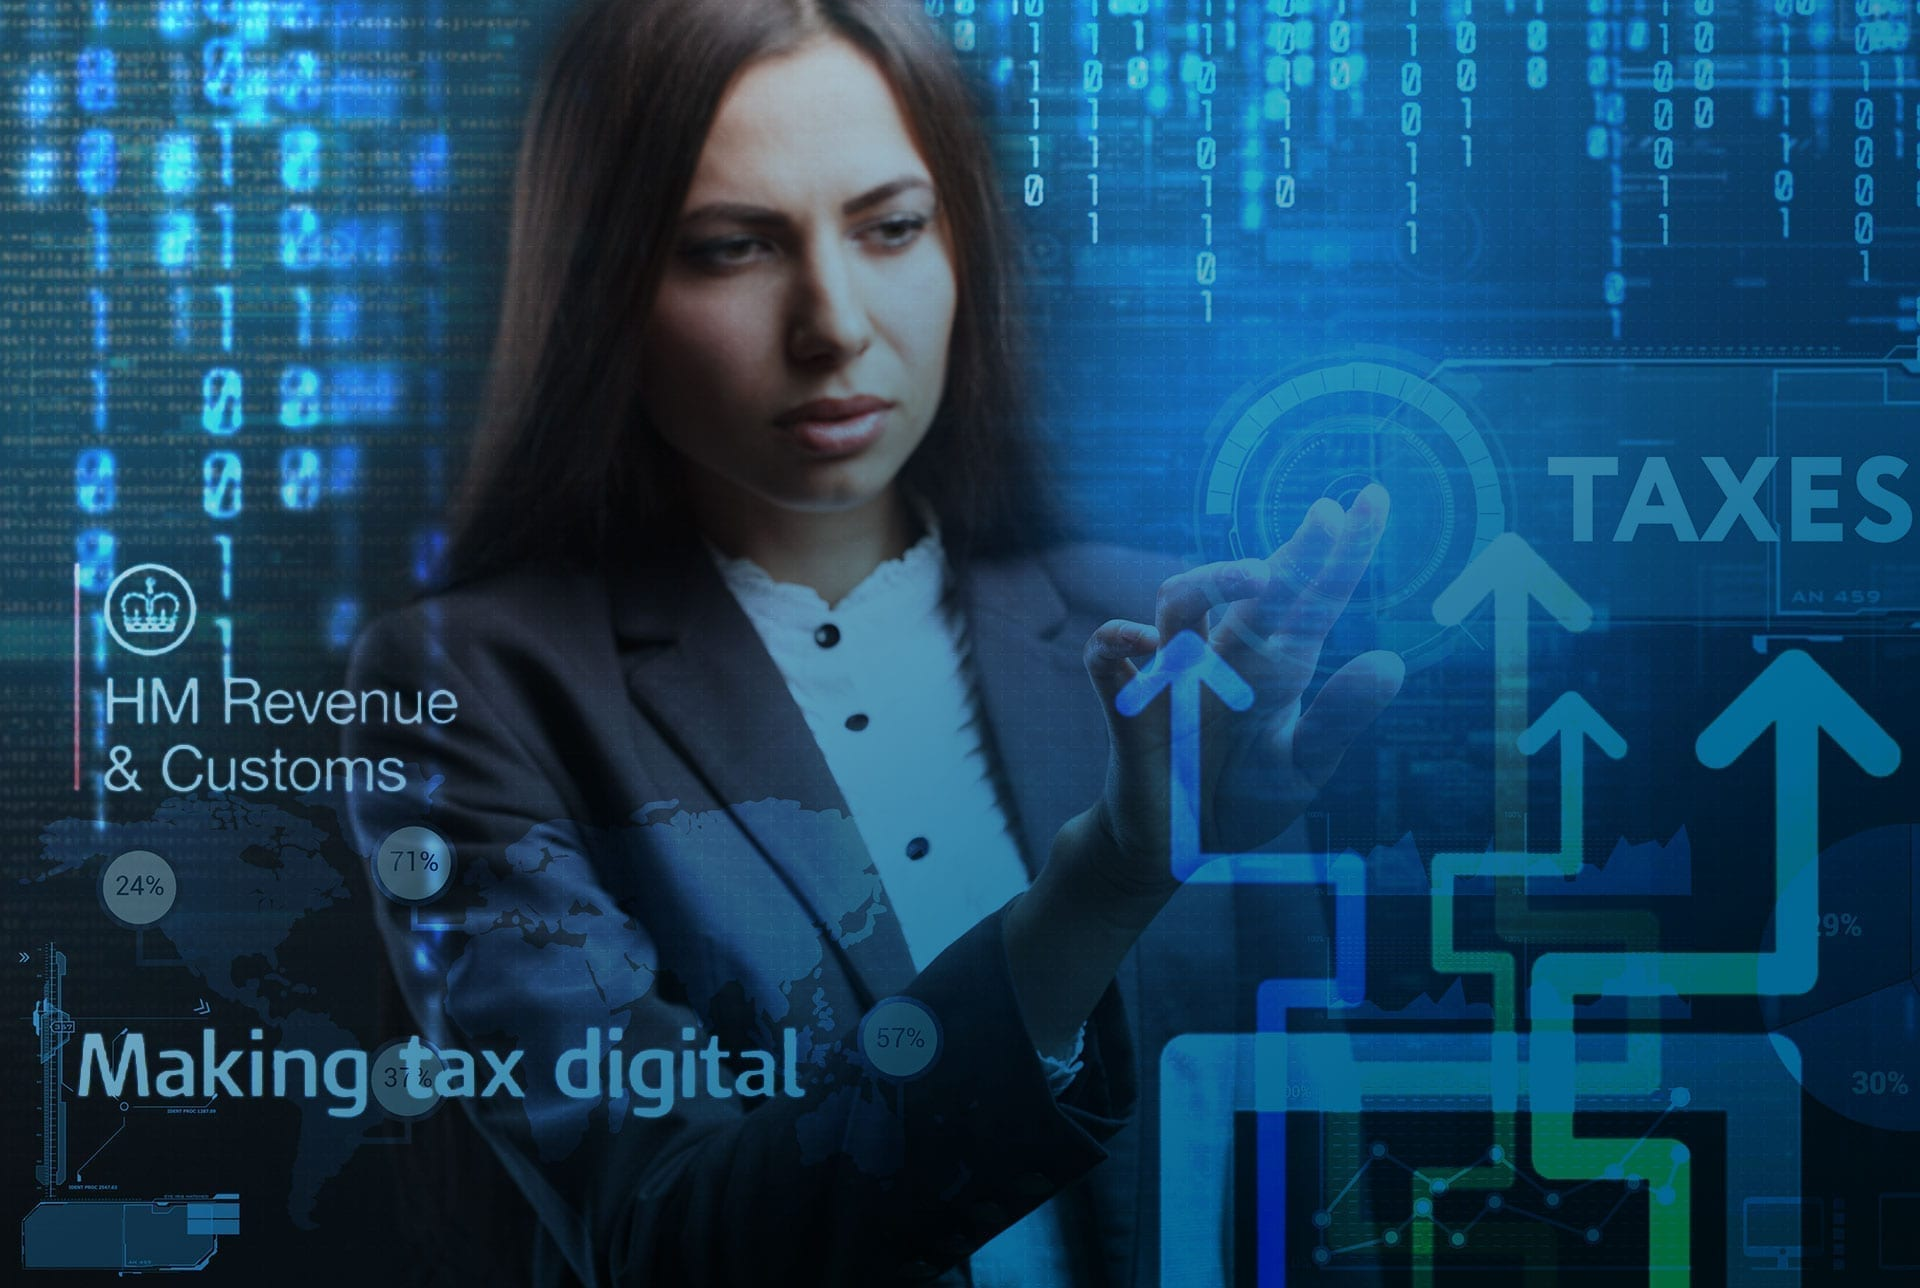 Matthews Hanton digital taxation advice